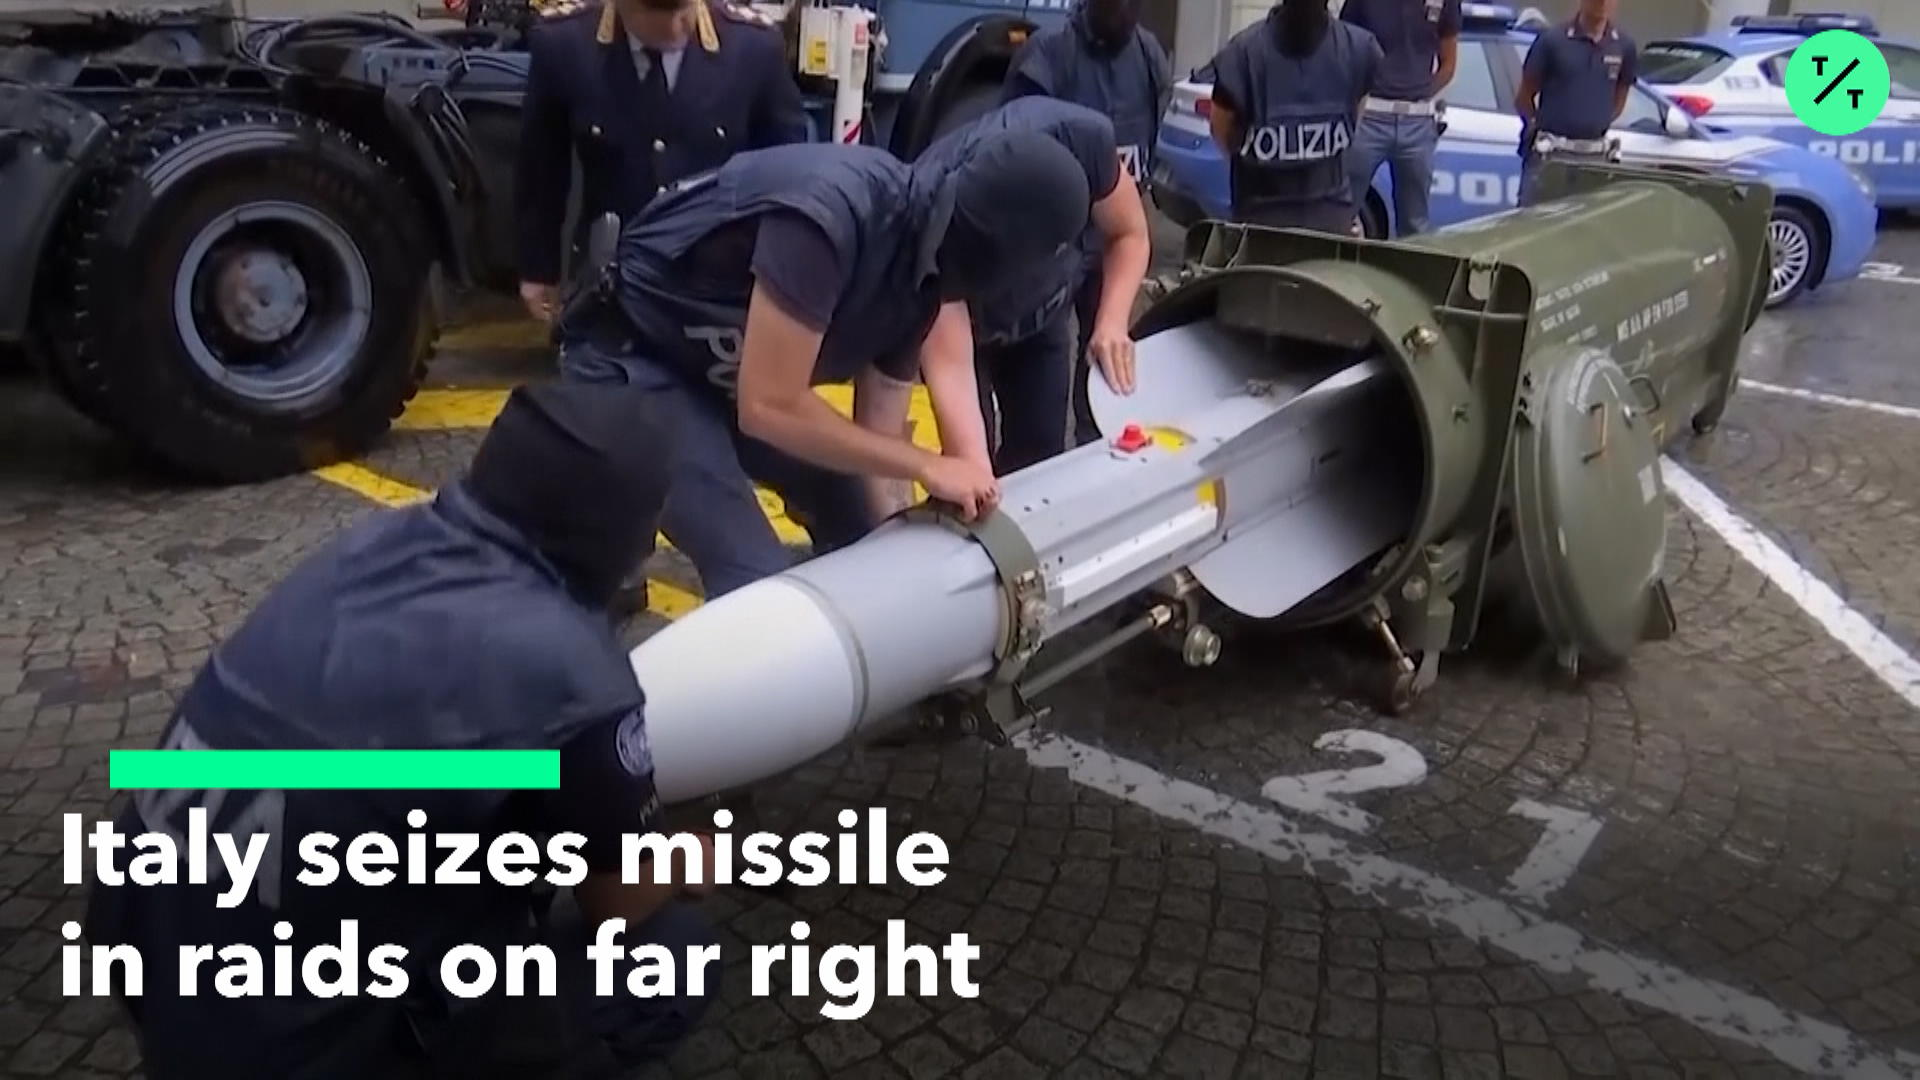 Italy Seizes Missile, Nazi Propaganda